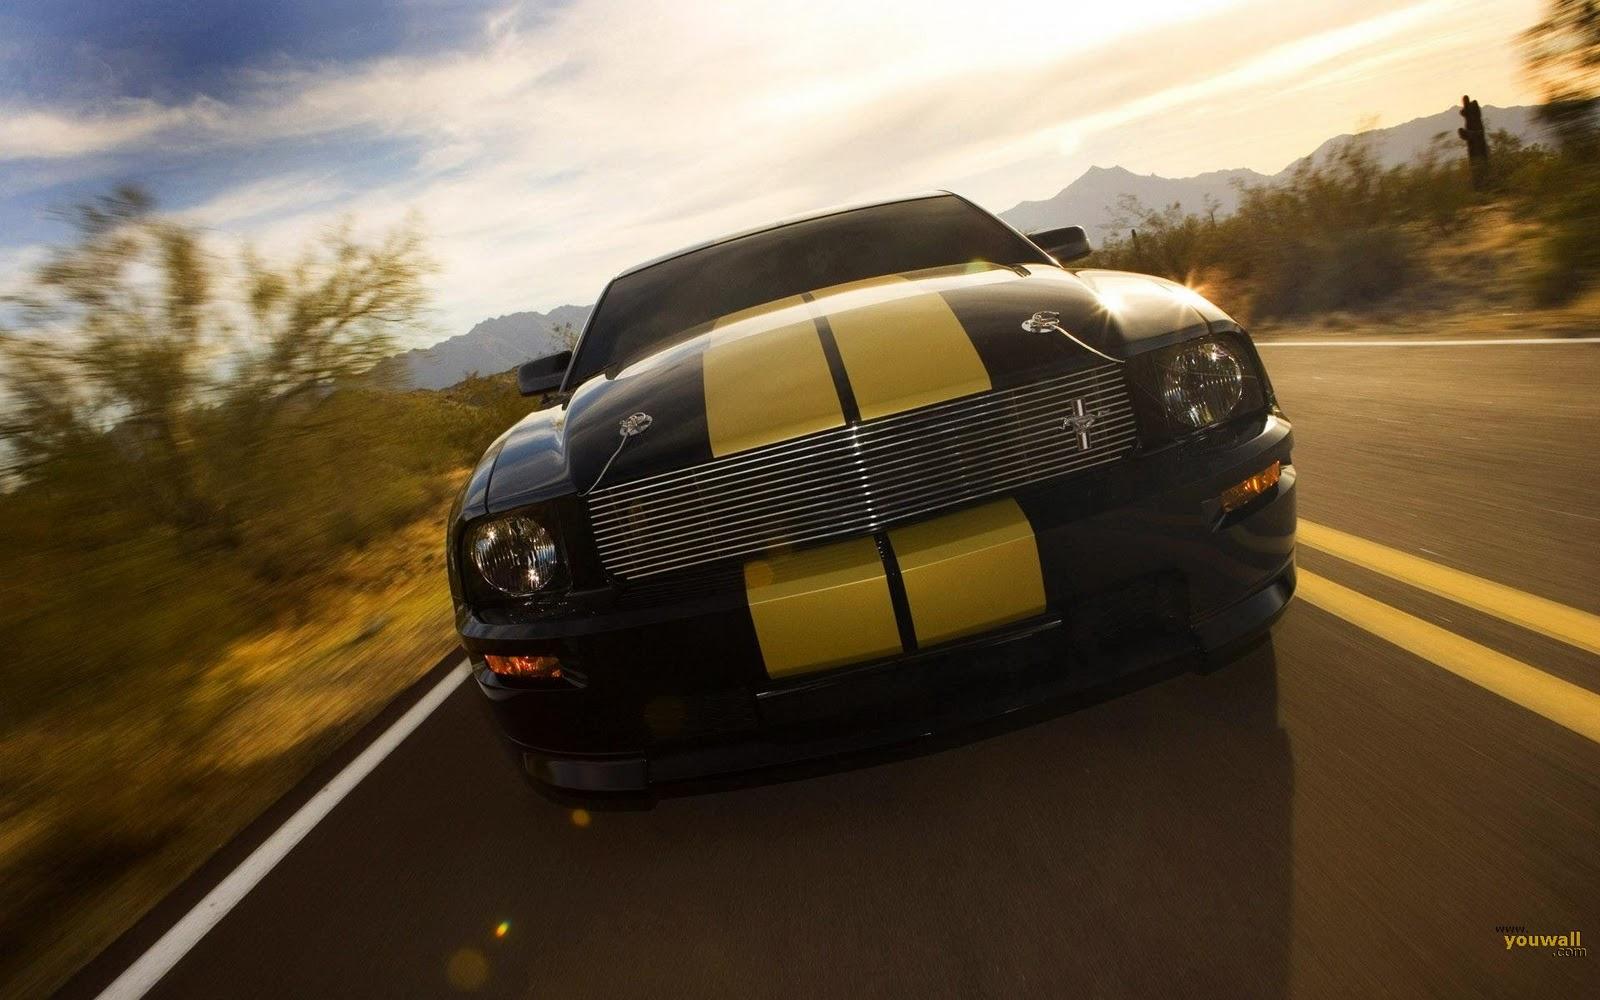 Cool Cars Wallpaper Cool Mustang Wallpaper